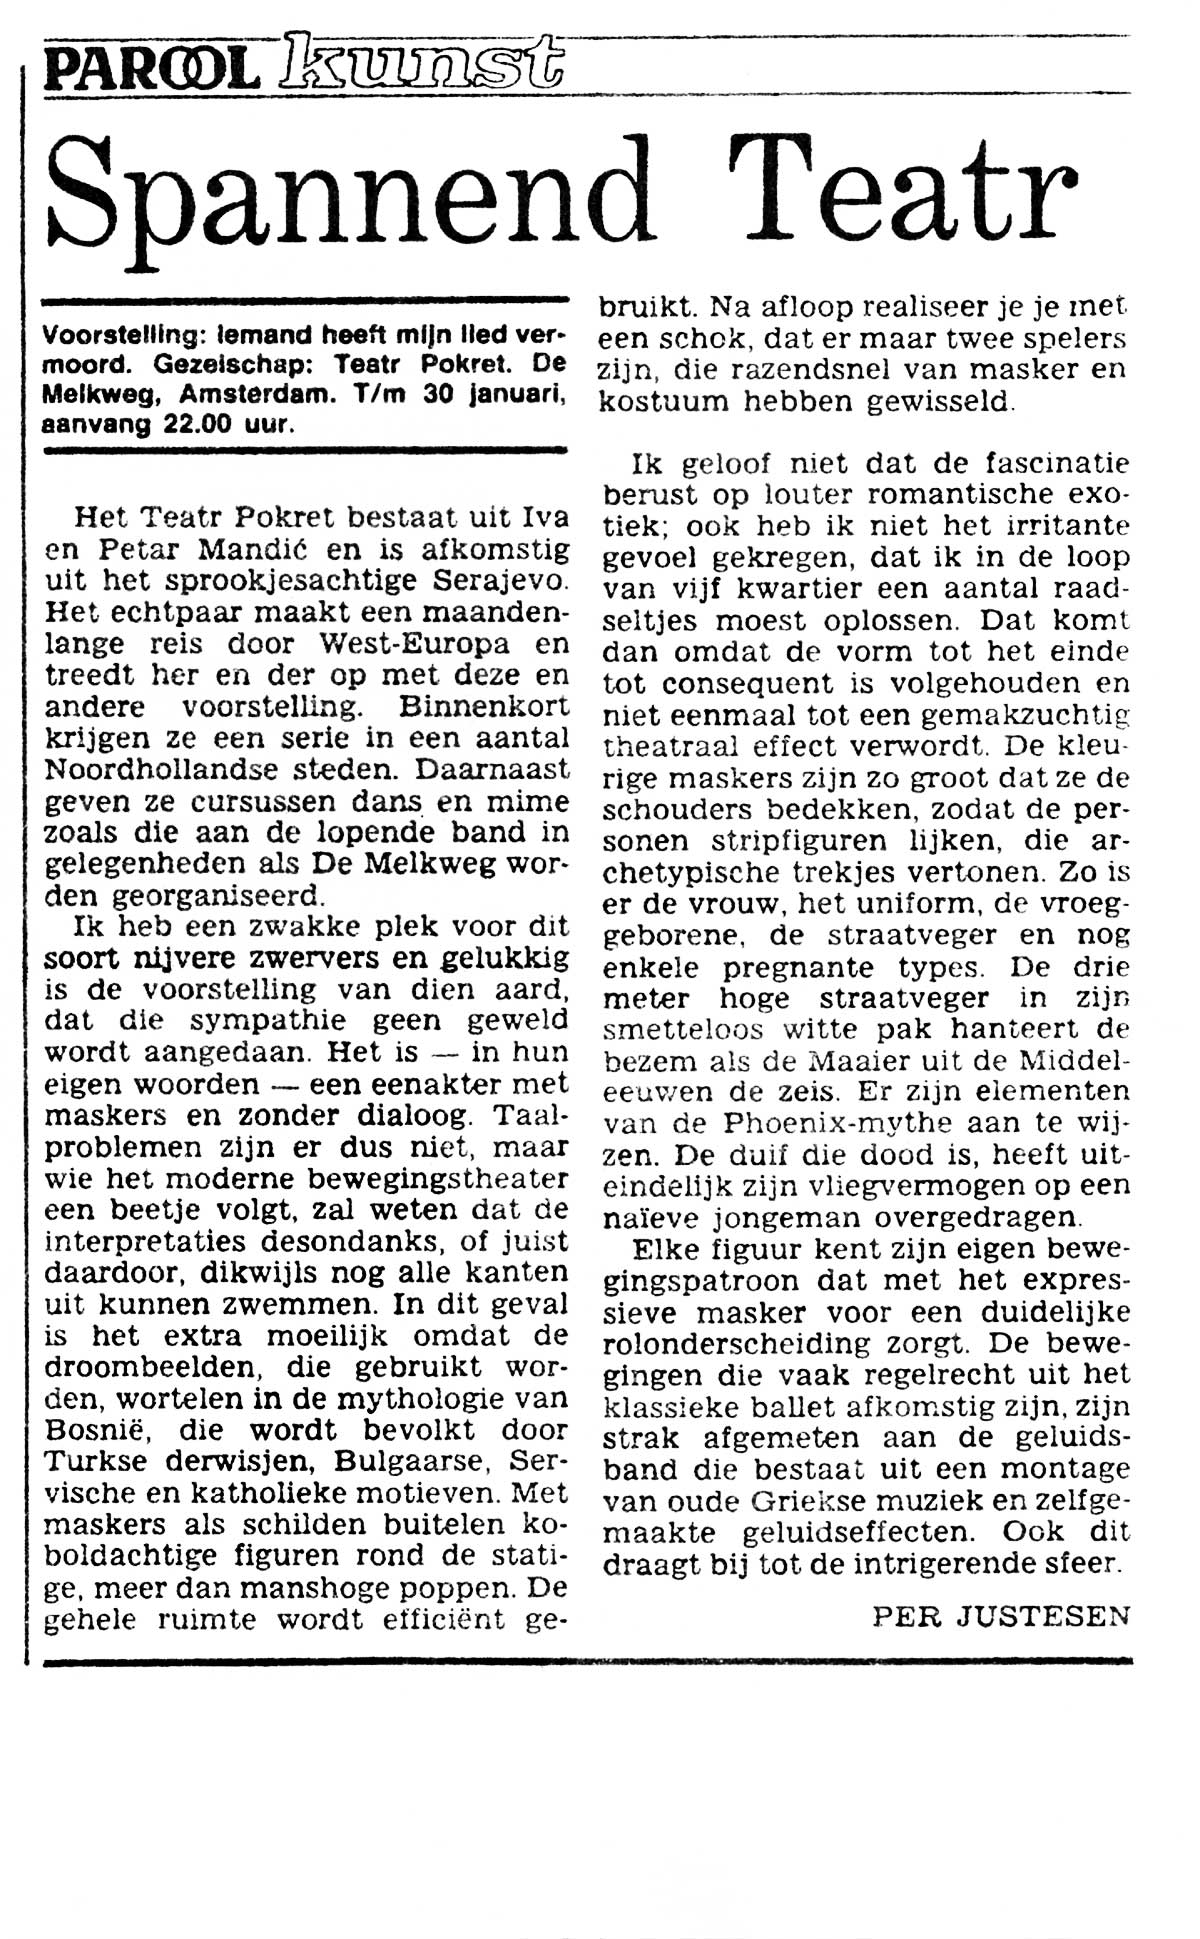 Press: Theatre Maska i Pokret - Somebody has Killed the Play - EXCITING THEATRE - Per Justesen